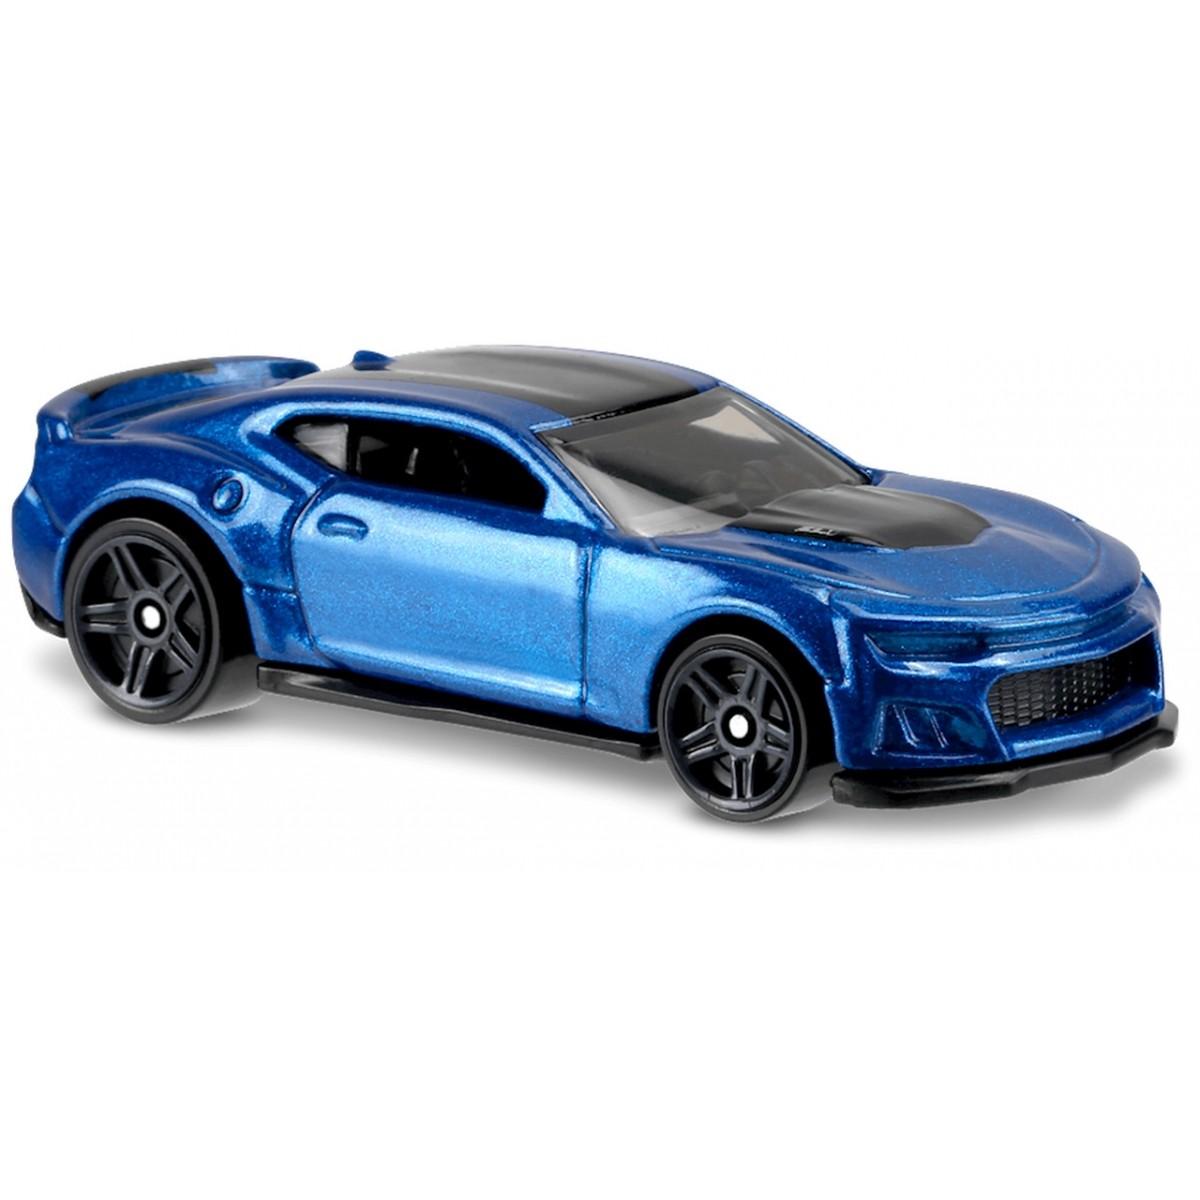 Carrinho Hot Wheels: 2017 Camaro ZL1 Azul